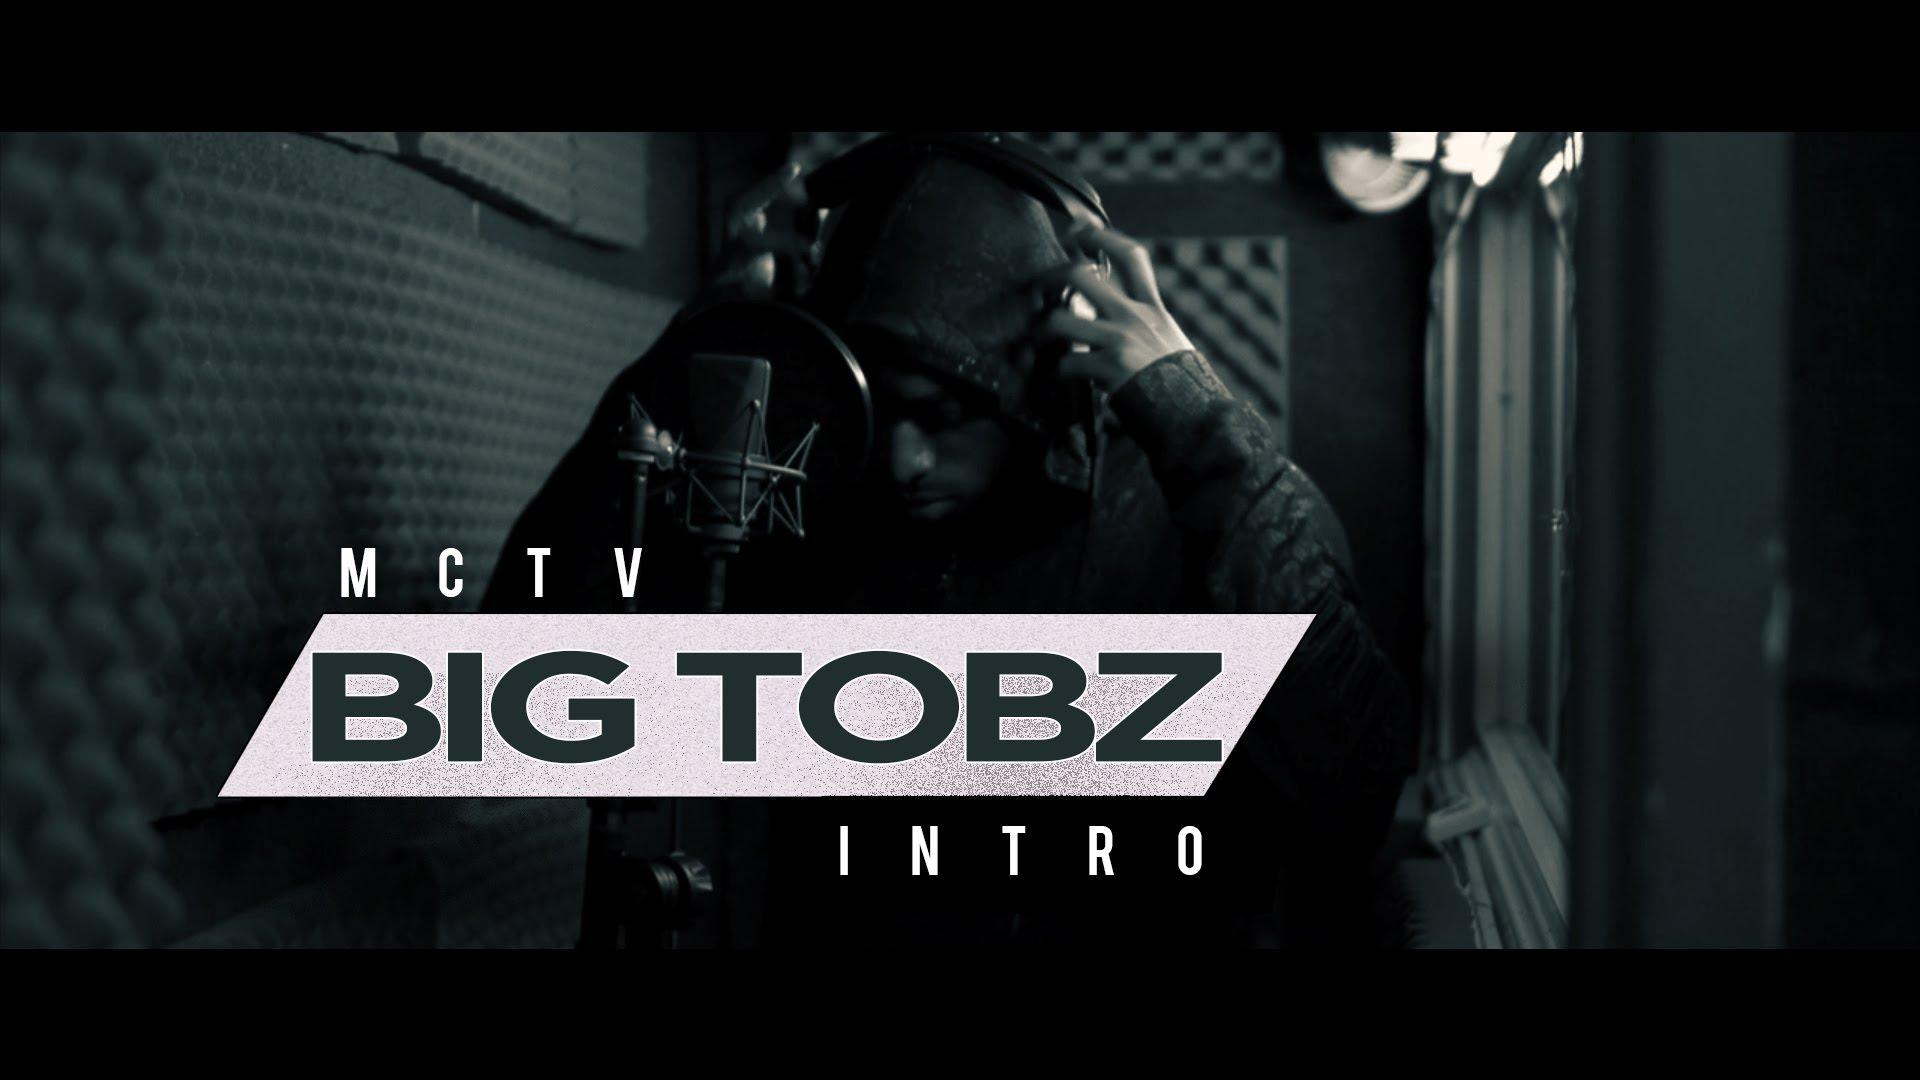 big tobz intro music video mctv bigtobzsf mctvuk hardest bars. Black Bedroom Furniture Sets. Home Design Ideas